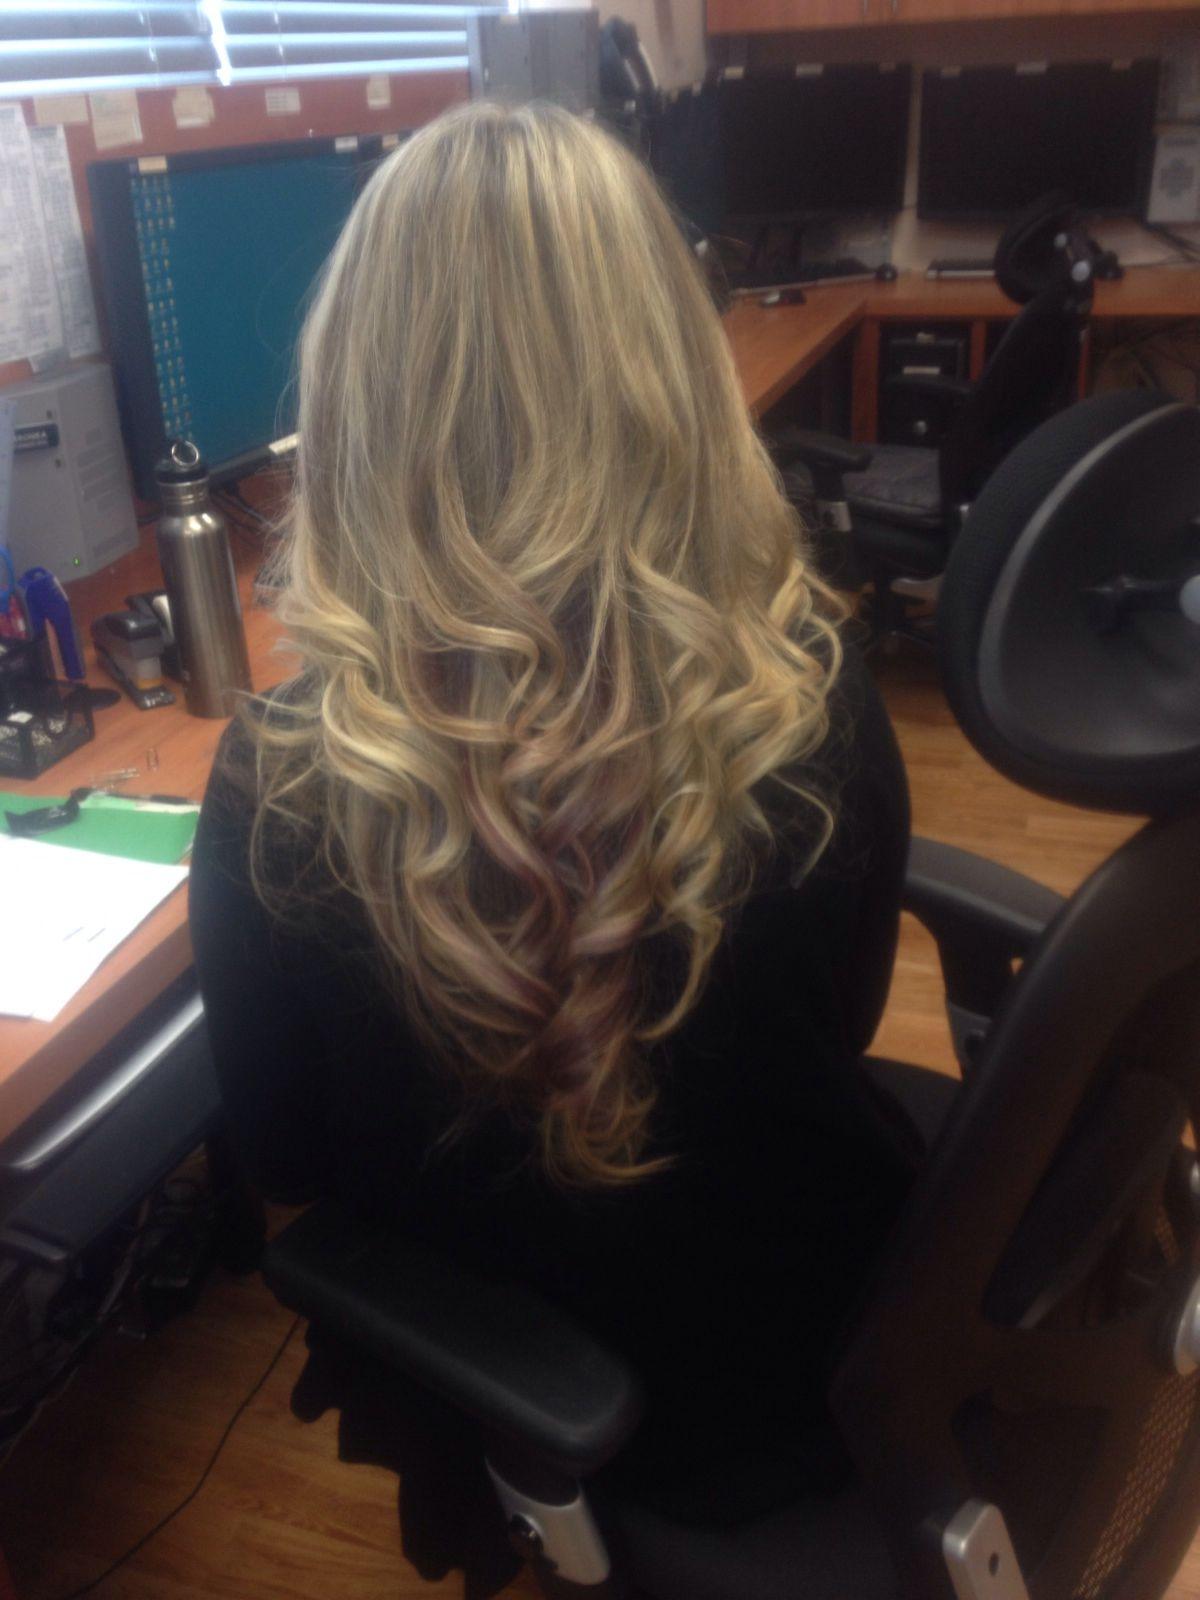 Blonde with bit of purple